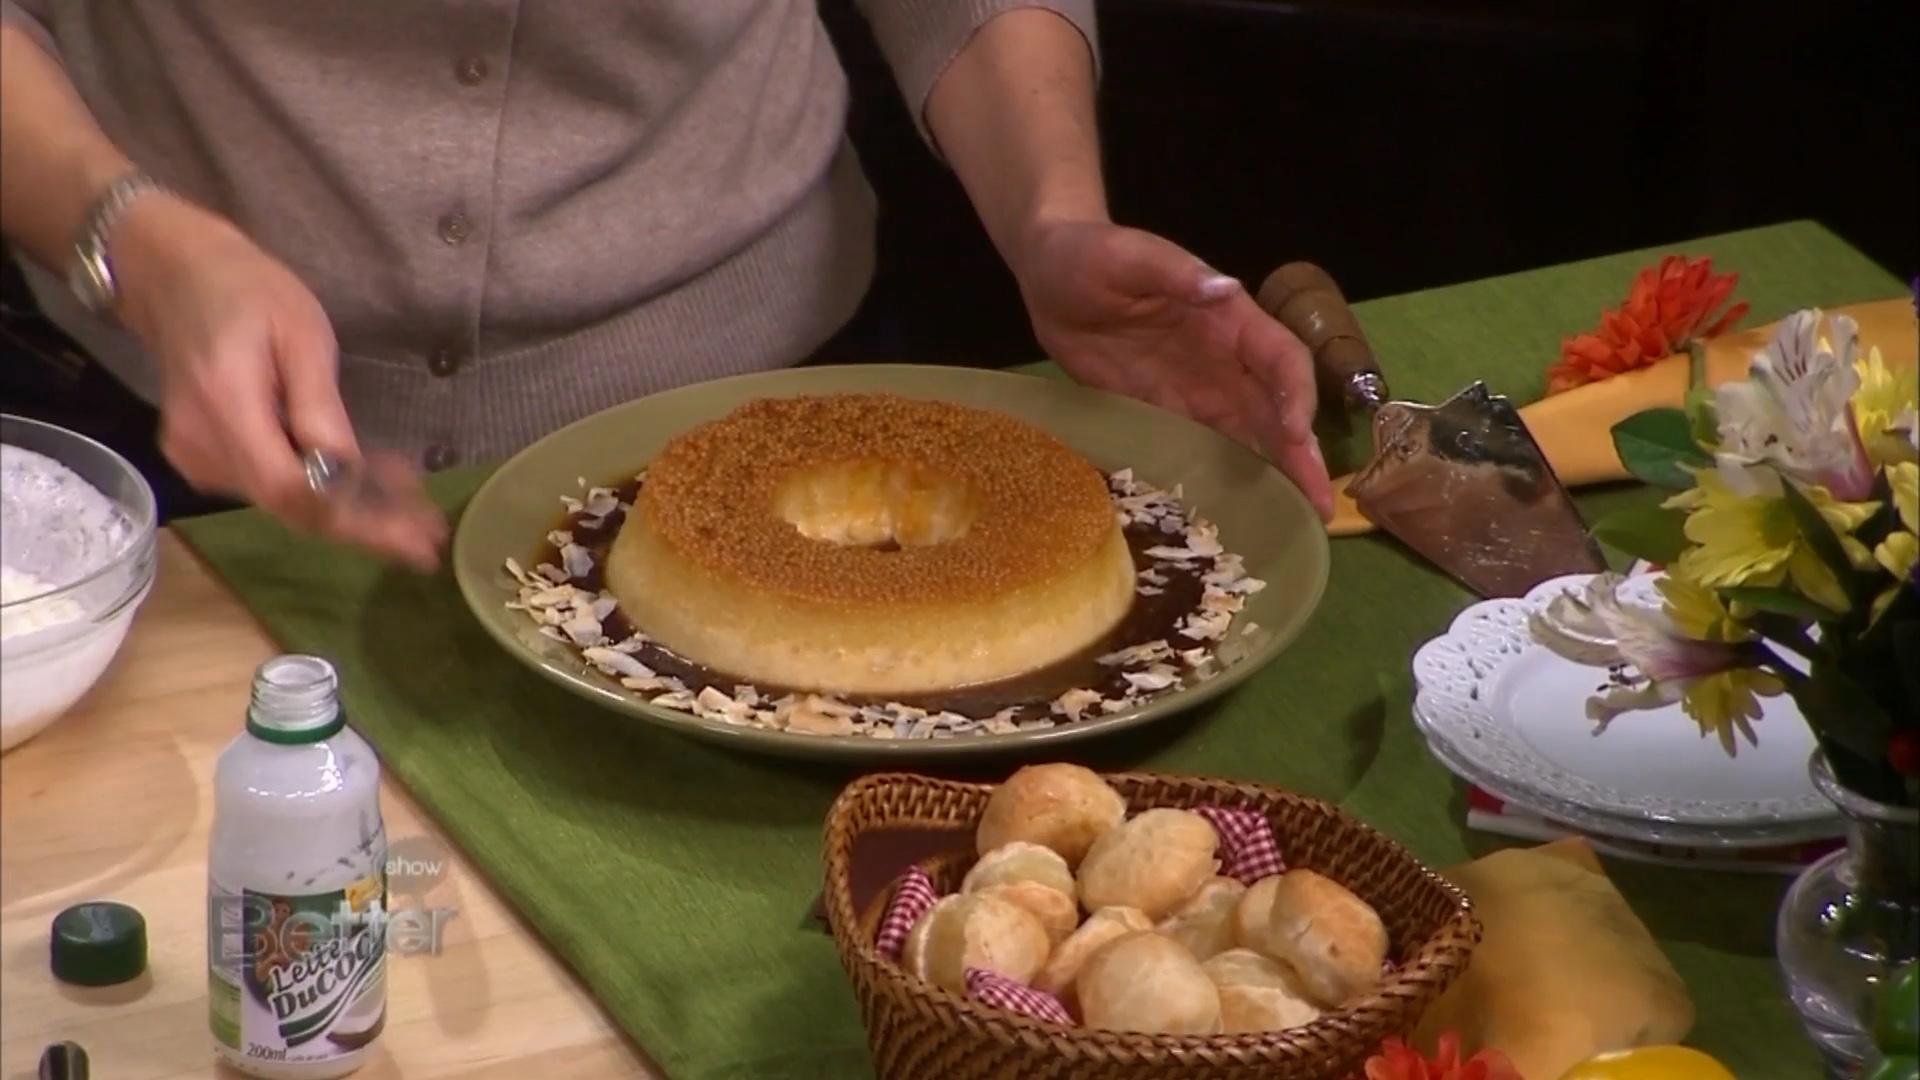 How to Make a Tapioca Pudding With Coconut Caramel Sauce